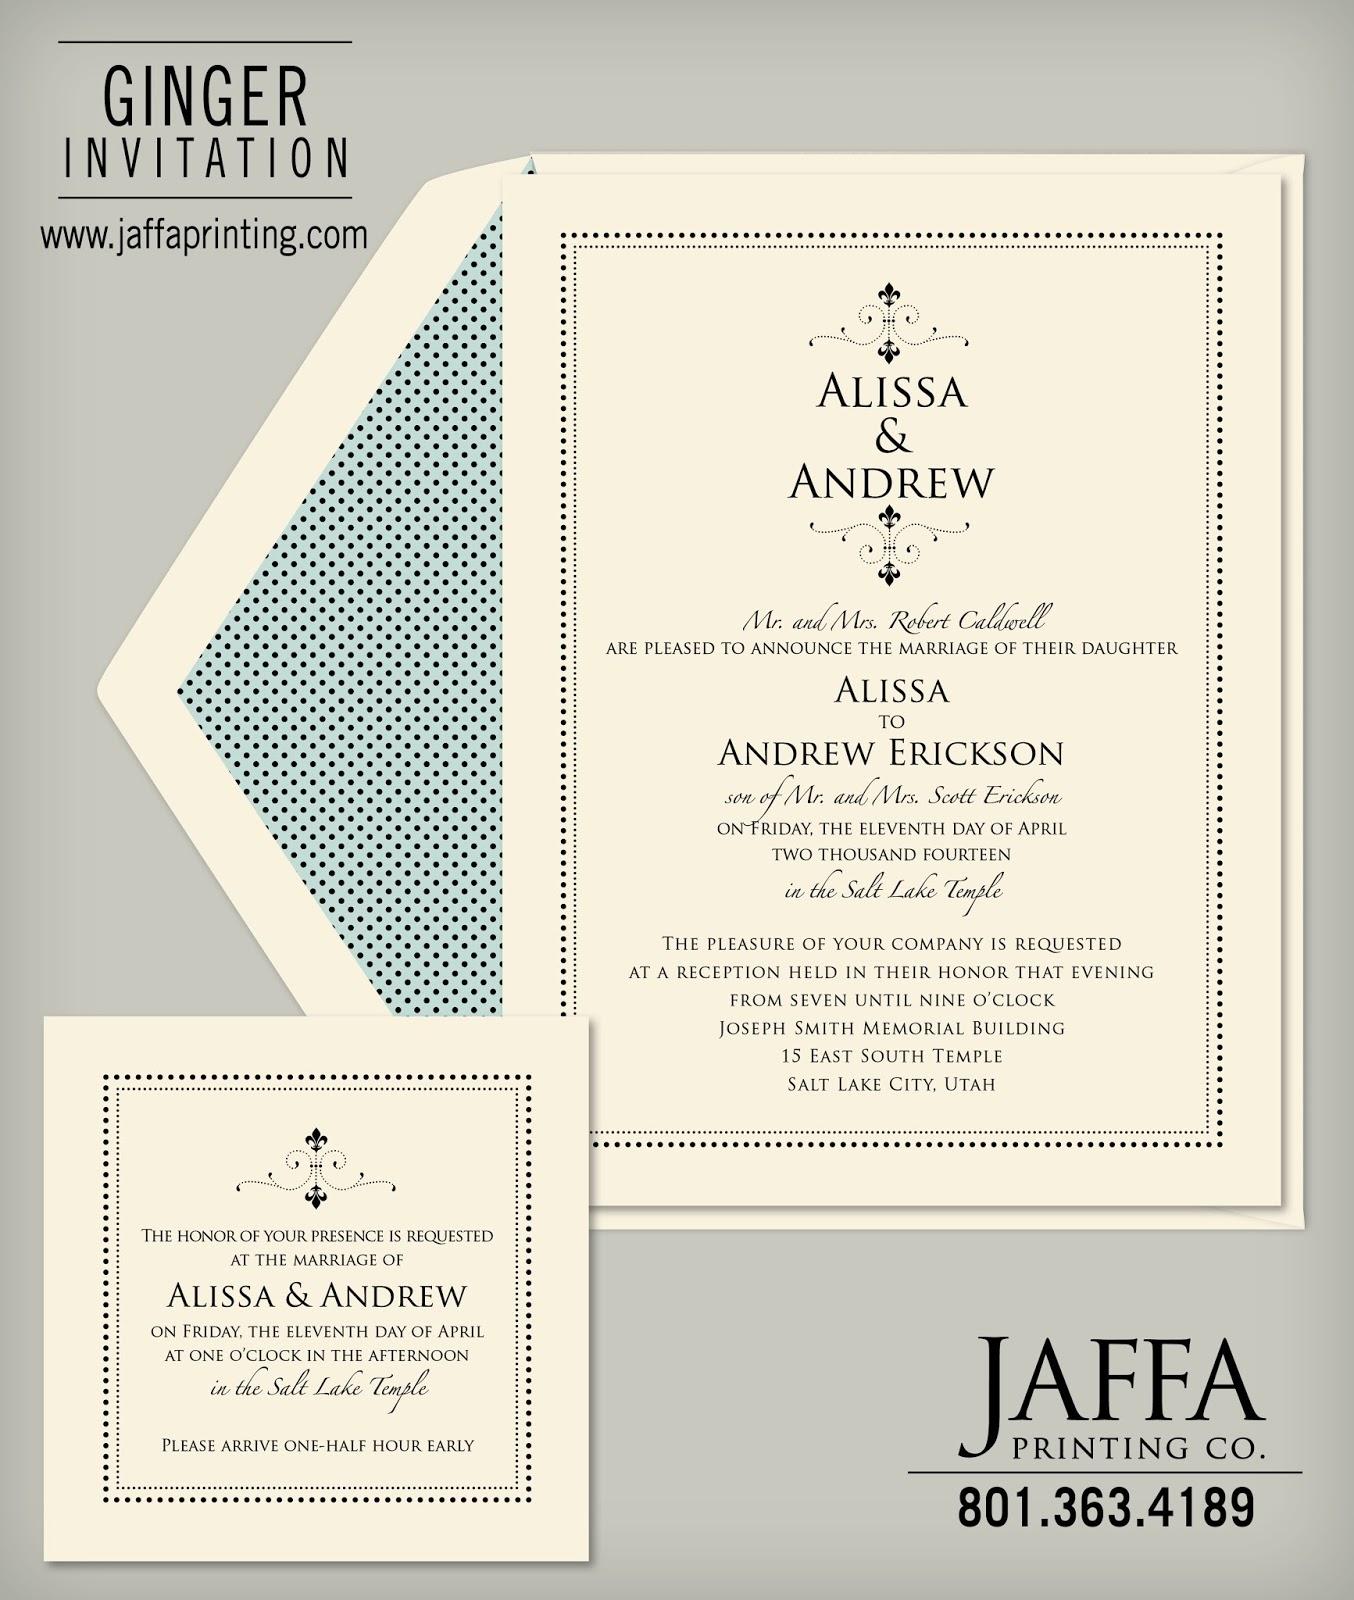 Wedding Invitation Blog: 3 Ways to Dress Up a Budget Wedding Invitation